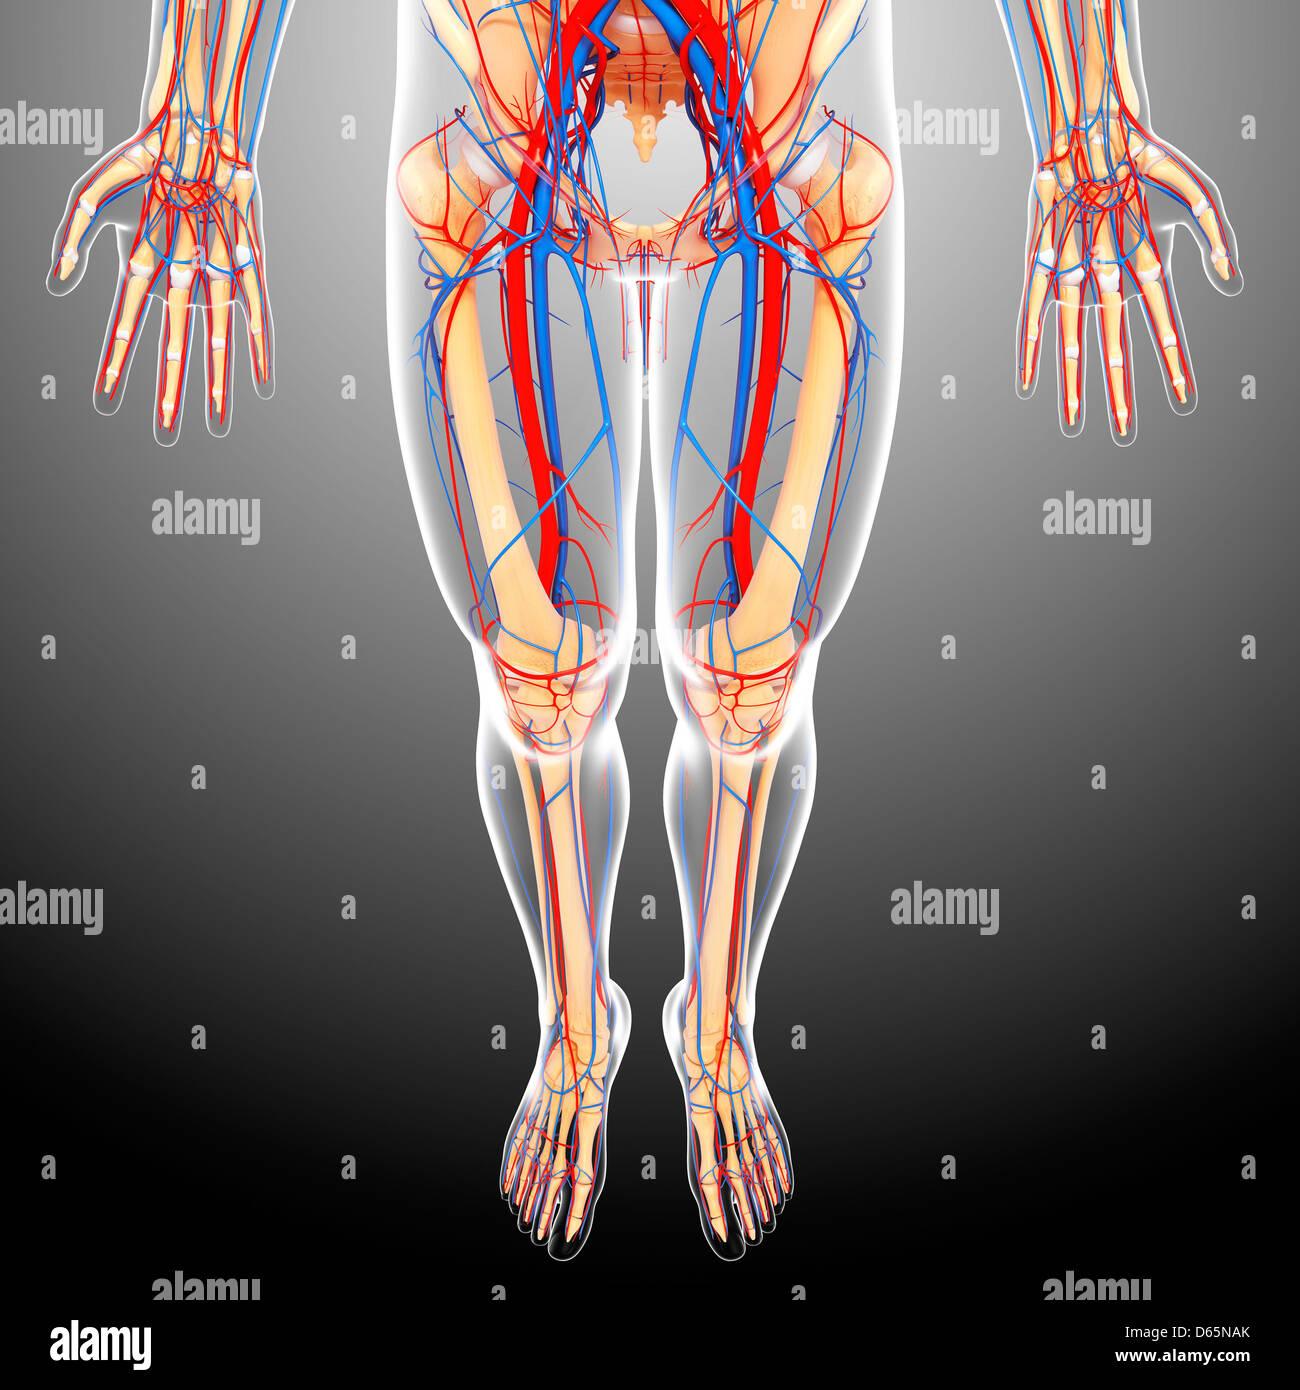 Lower body anatomy, artwork - Stock Image